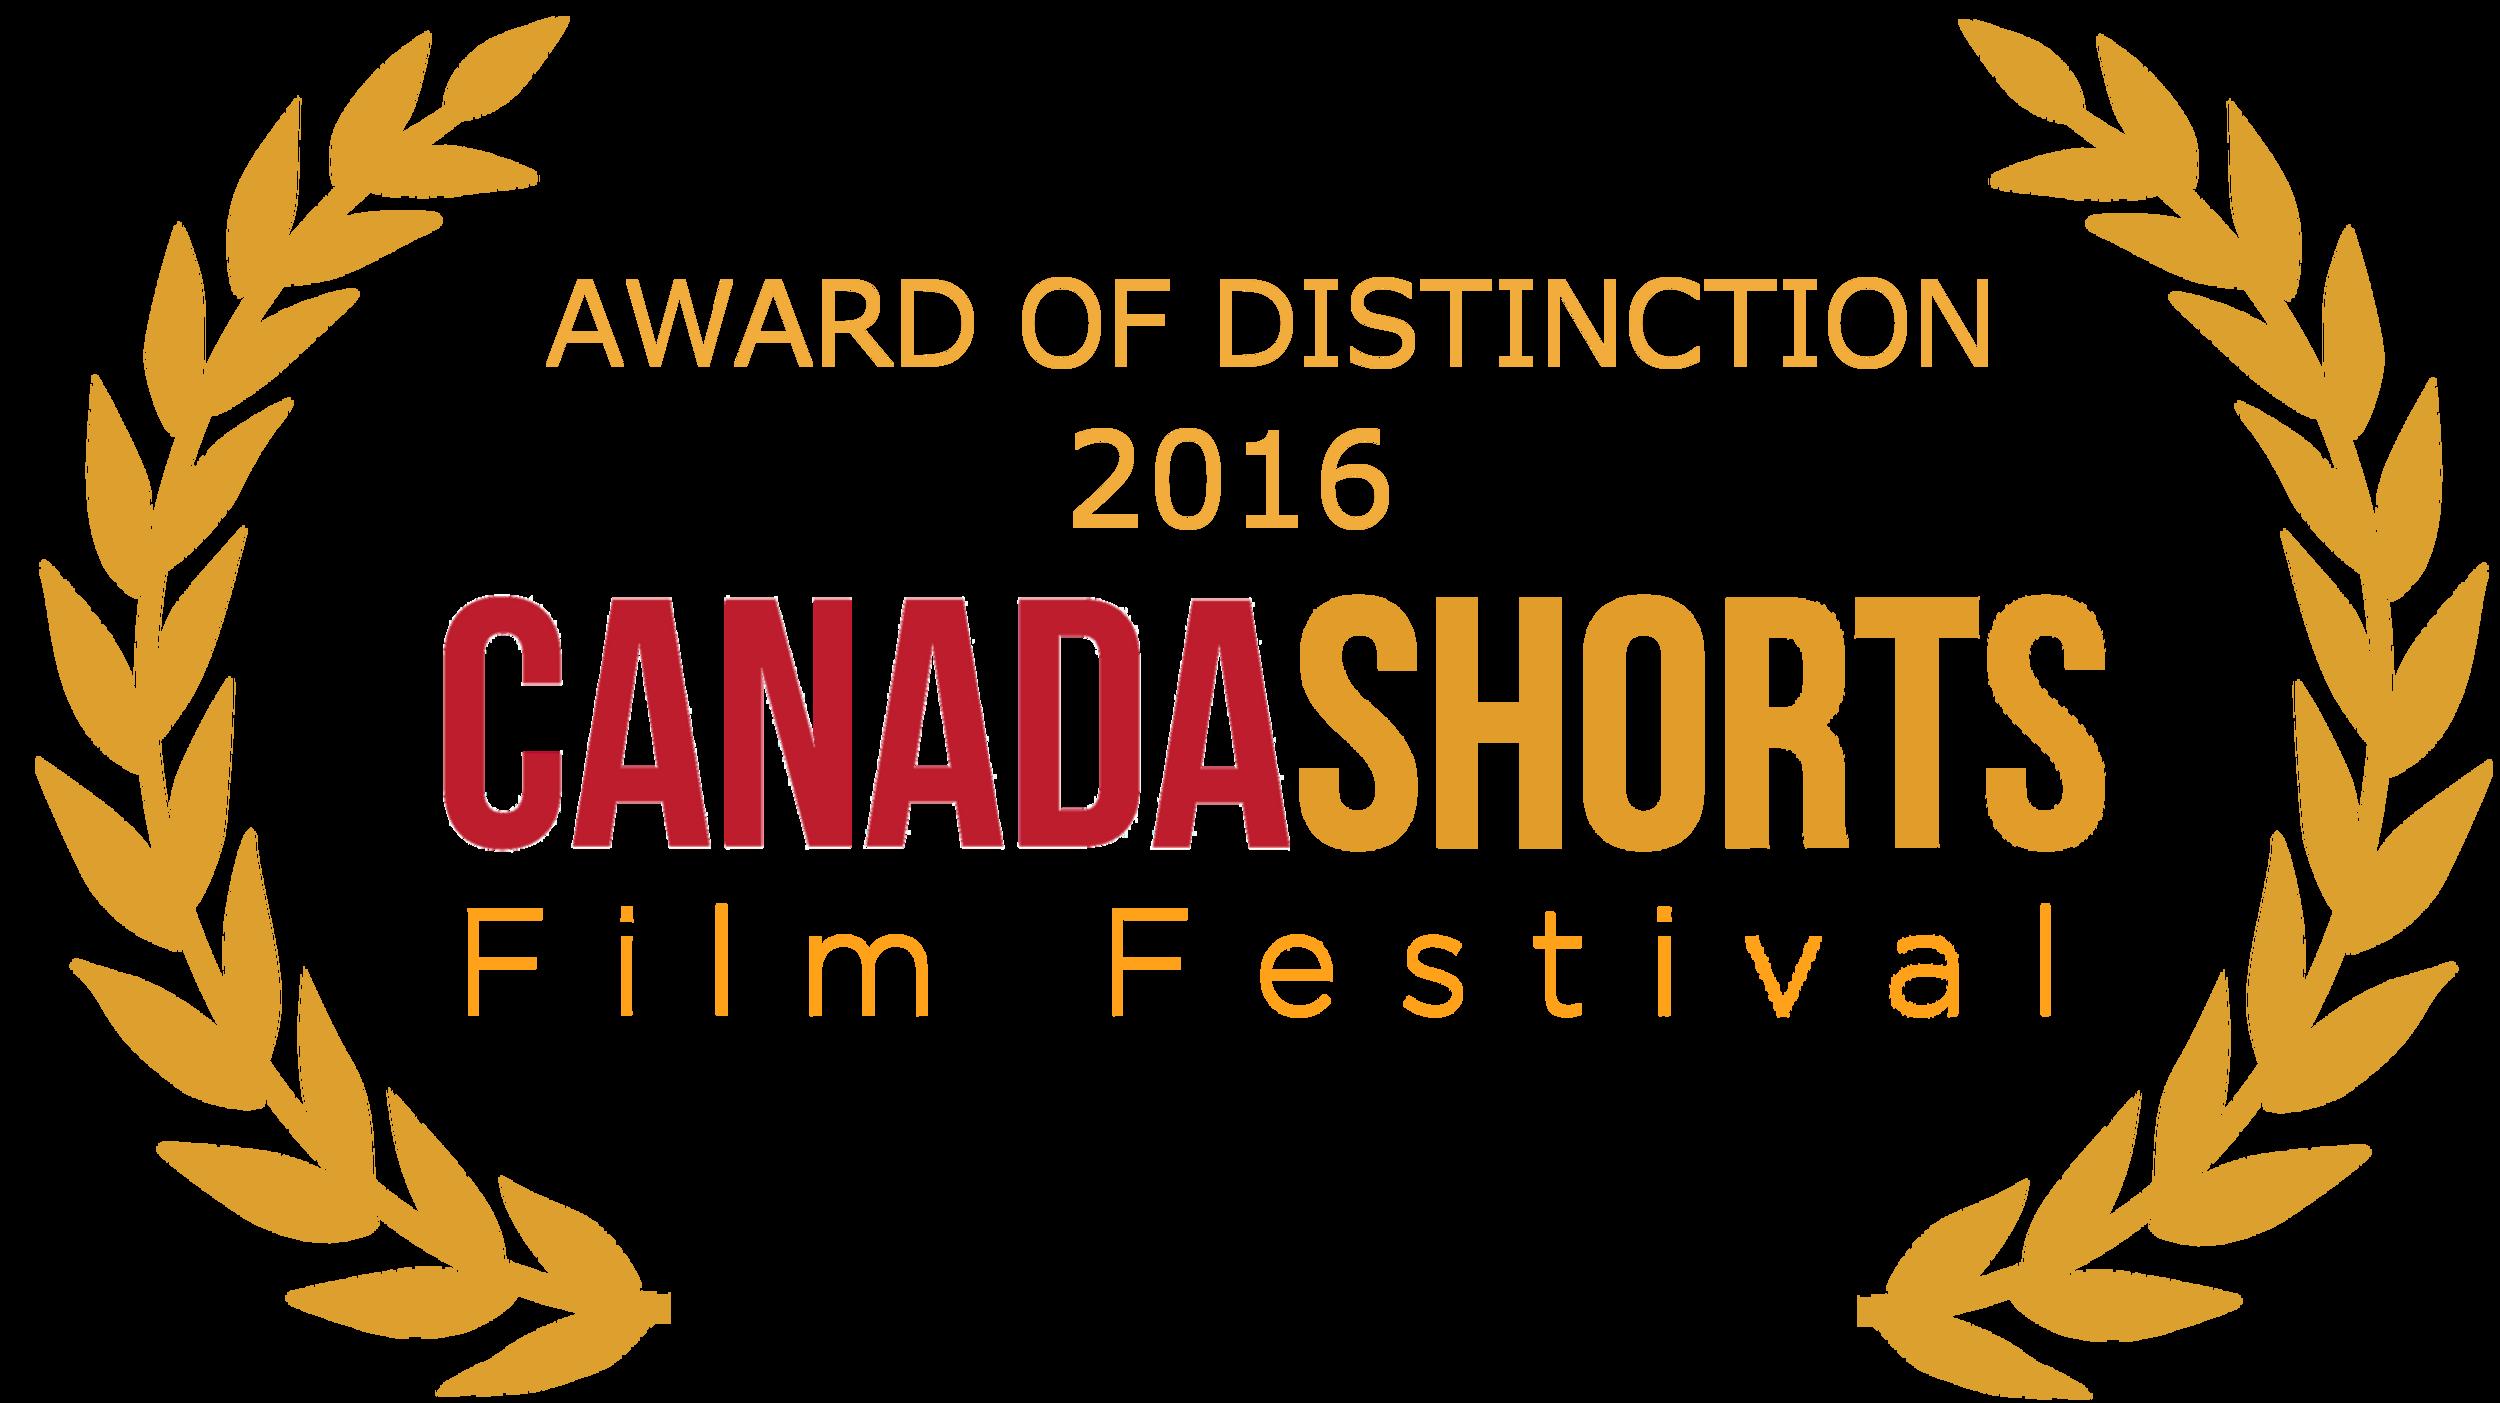 Canada shorts AWARD OF DISTINCTION laurel - gold.png